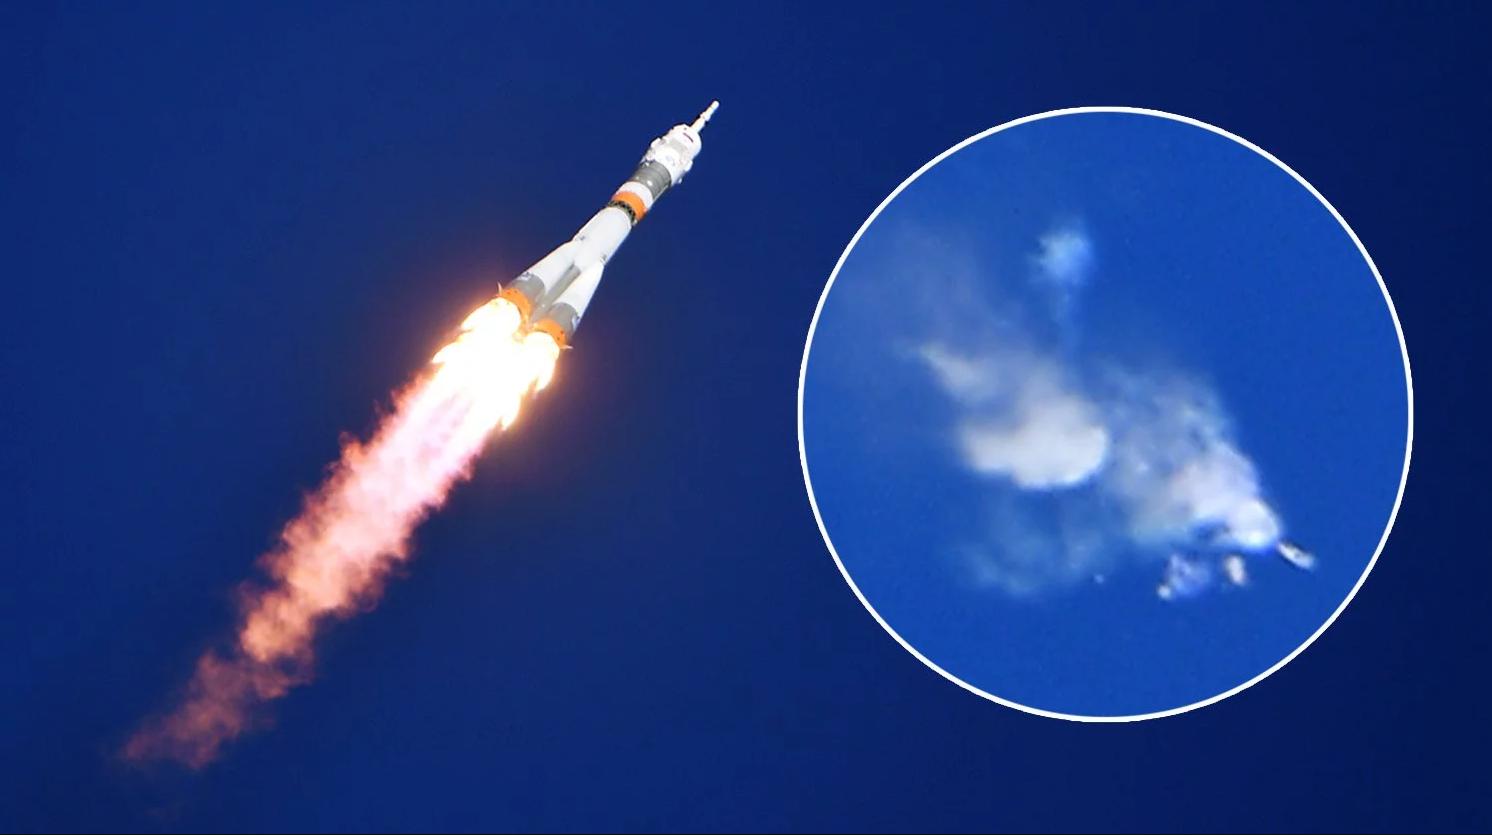 В интернет попал момент взрыва на ракете-носителе «Союз-ФГ»